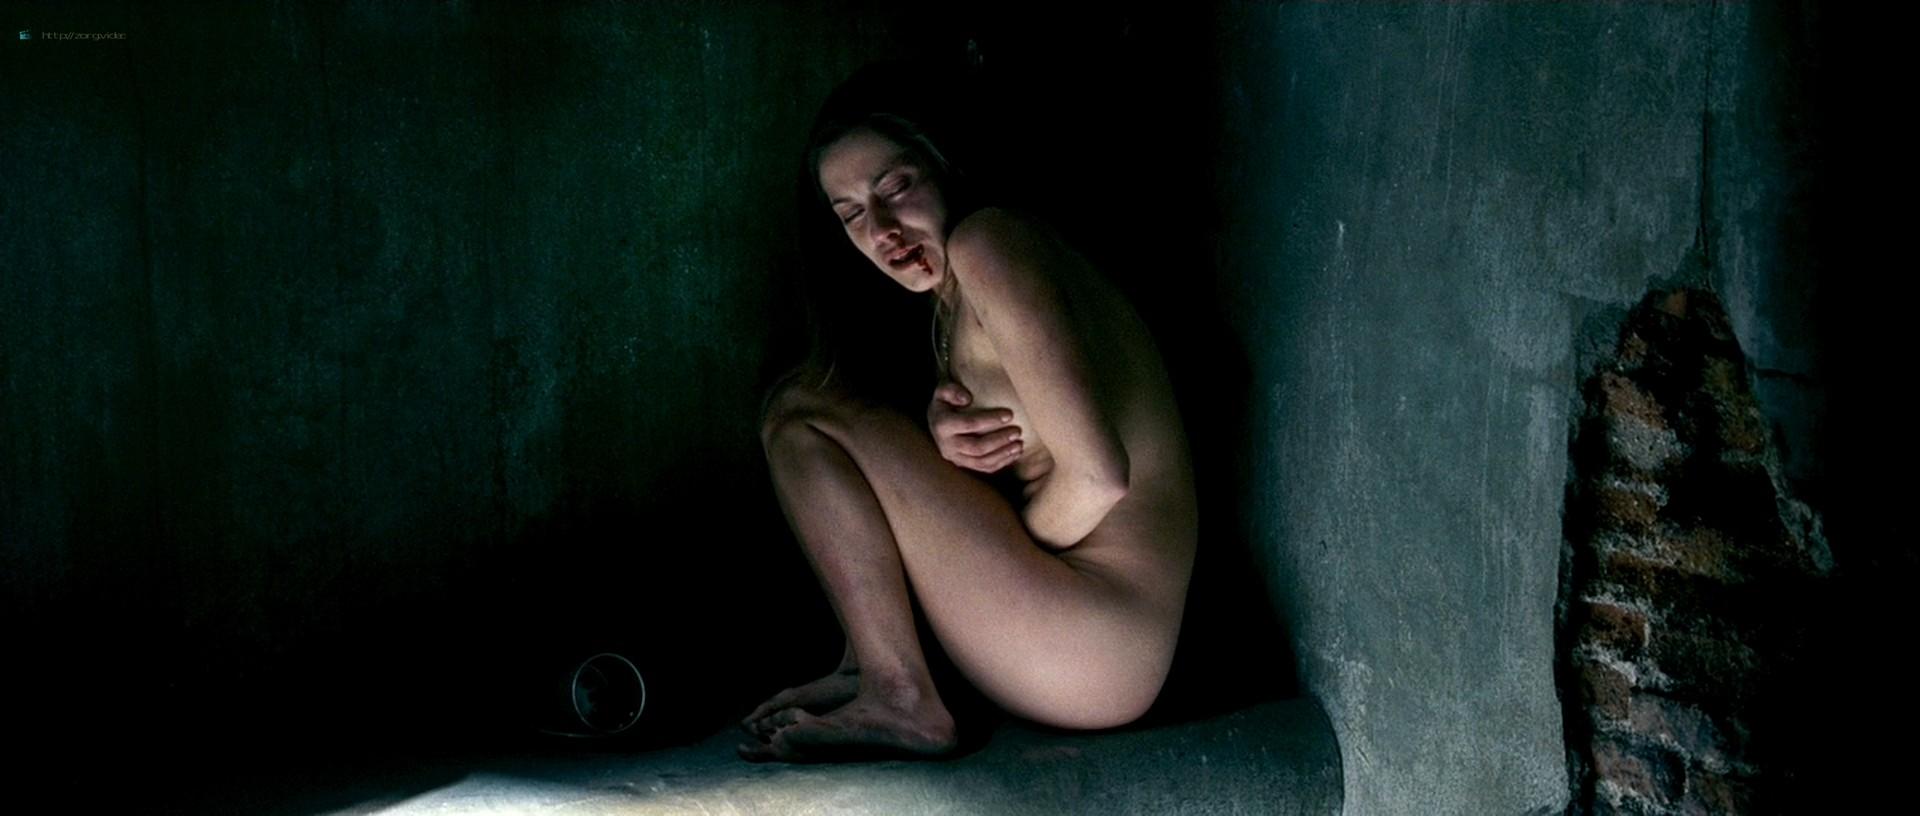 Maria Leon nude in - La voz dormida (2011) HD 1080p BluRay (5)